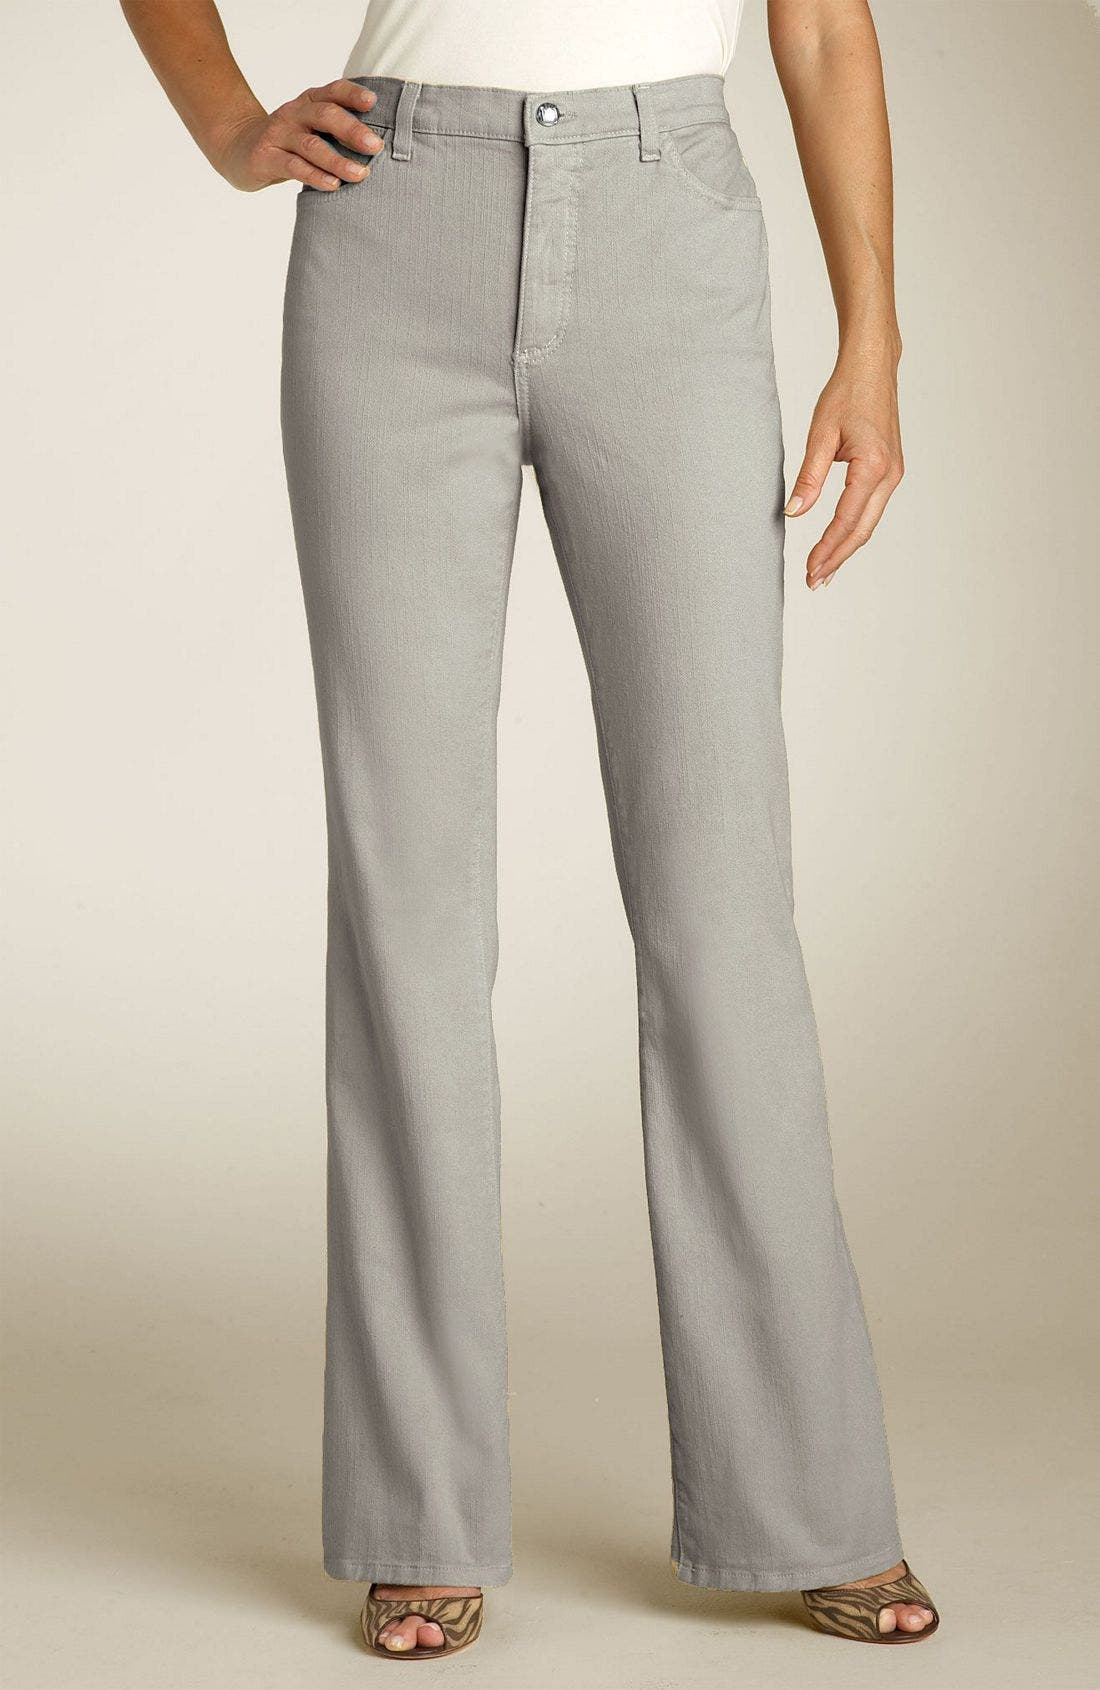 'Sarah' Stretch Bootcut Jeans, Main, color, 059